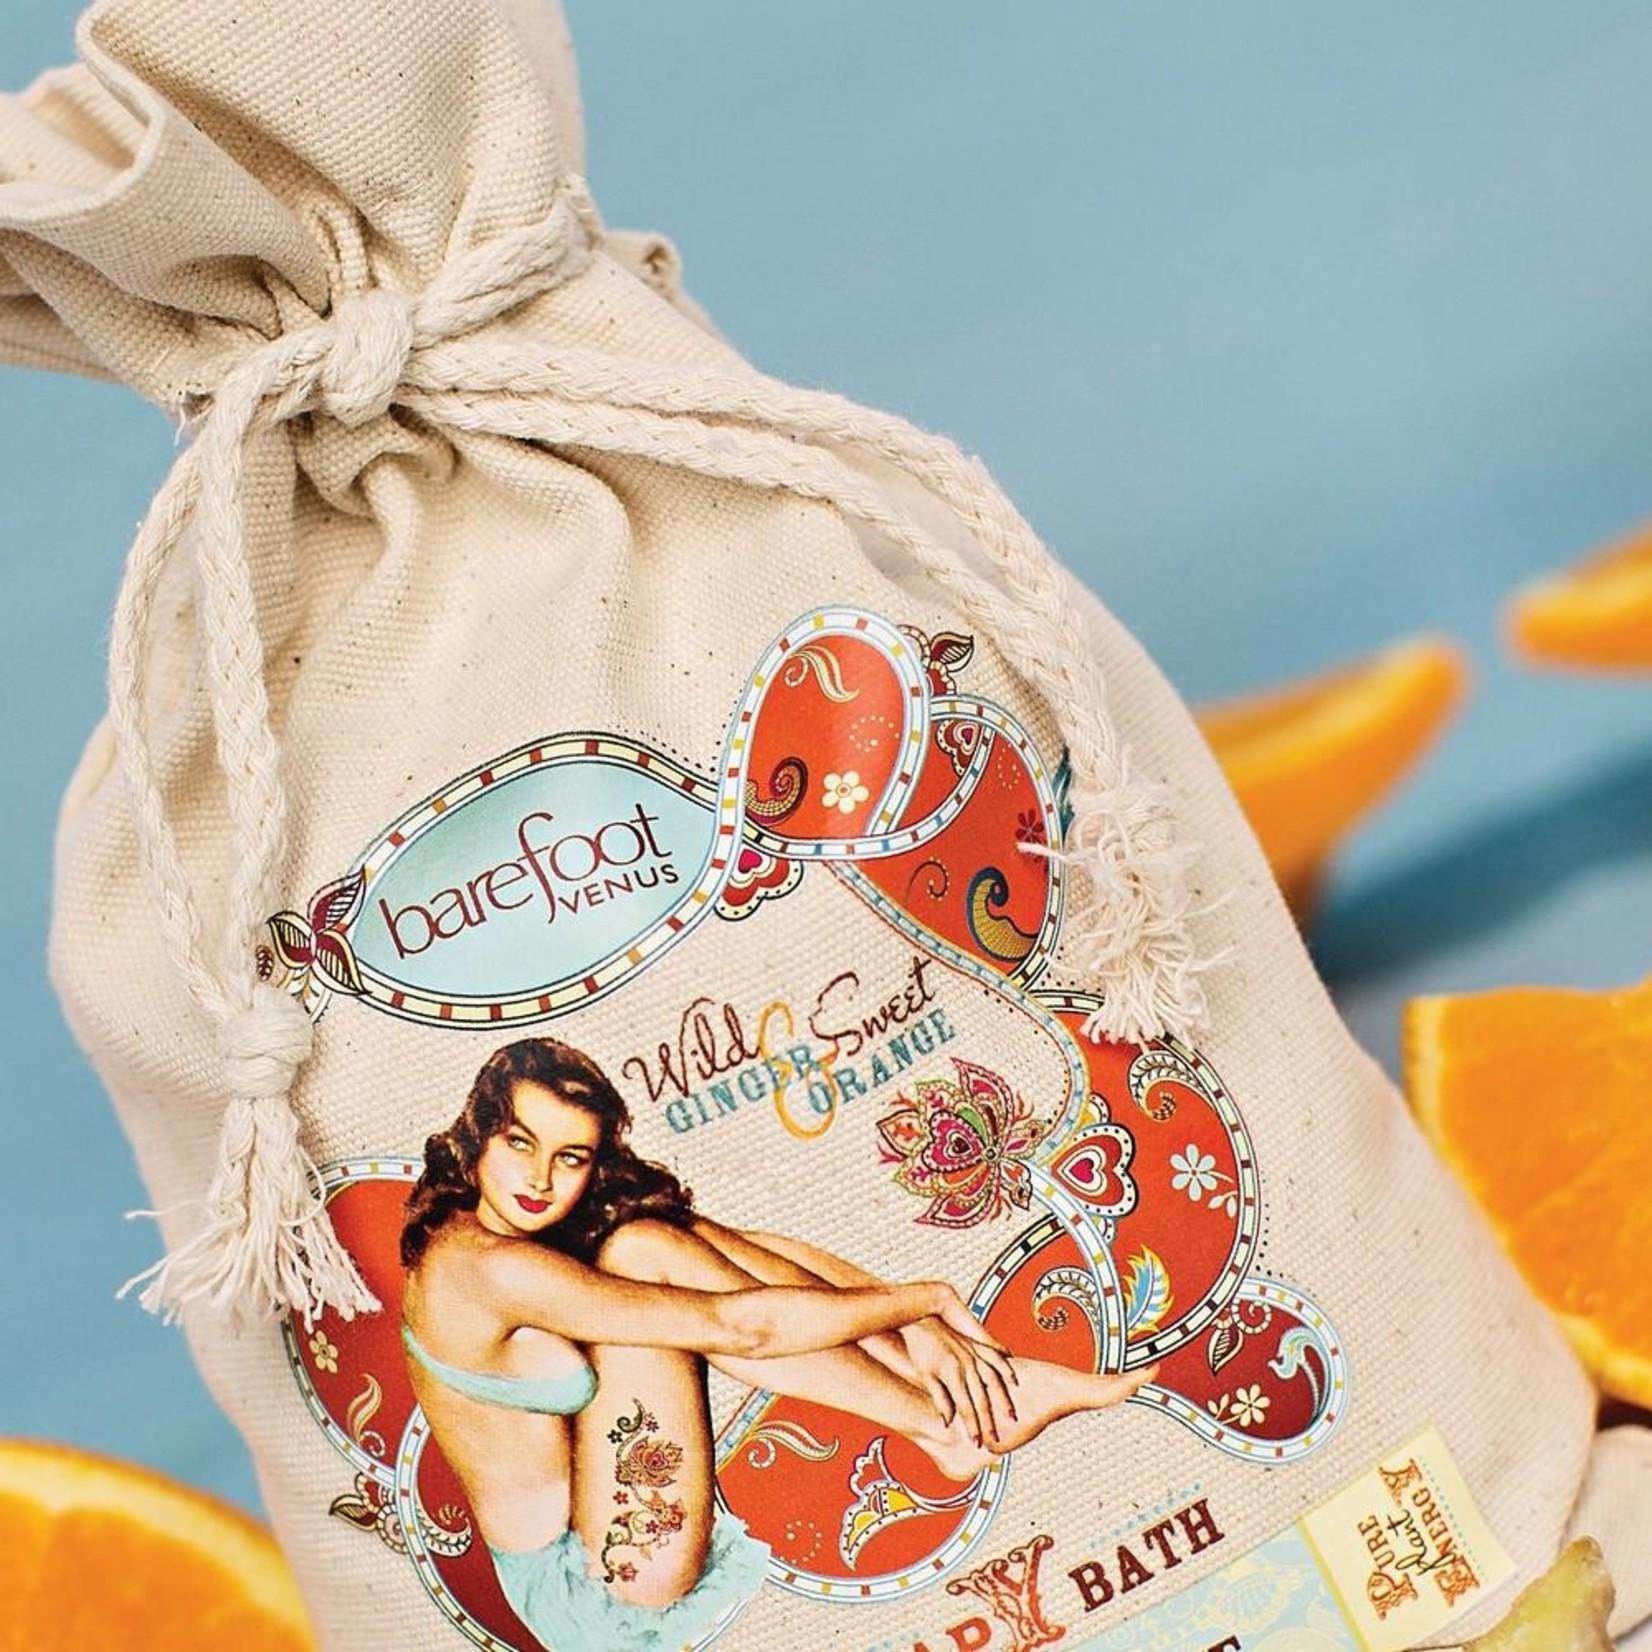 Barefoot Venus Wild Ginger & Sweet Orange ~ Oat Therapy Bath